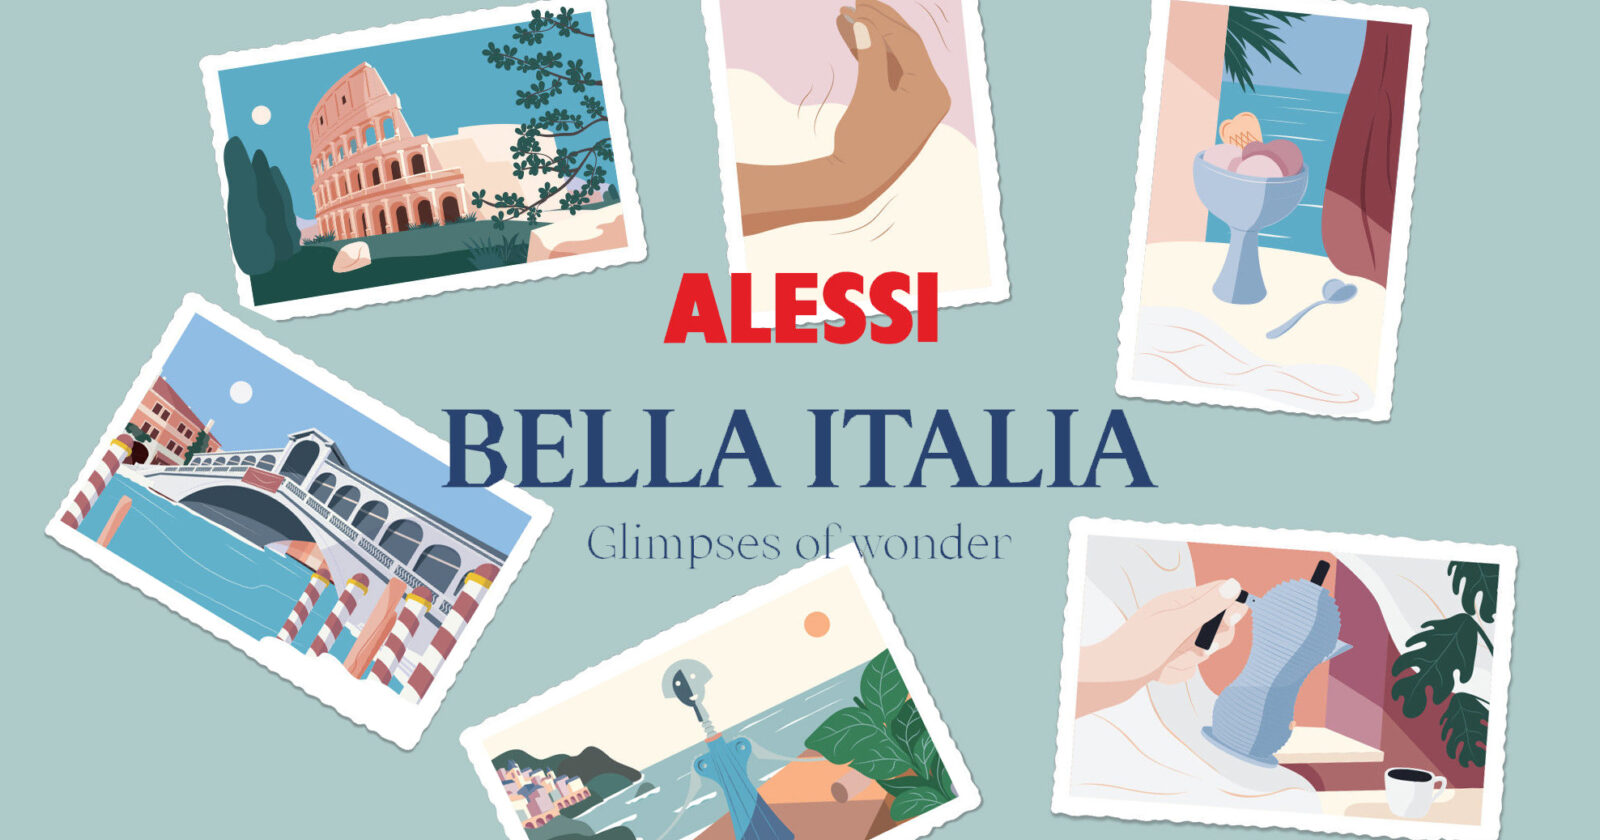 Alessi bella italia postal cards